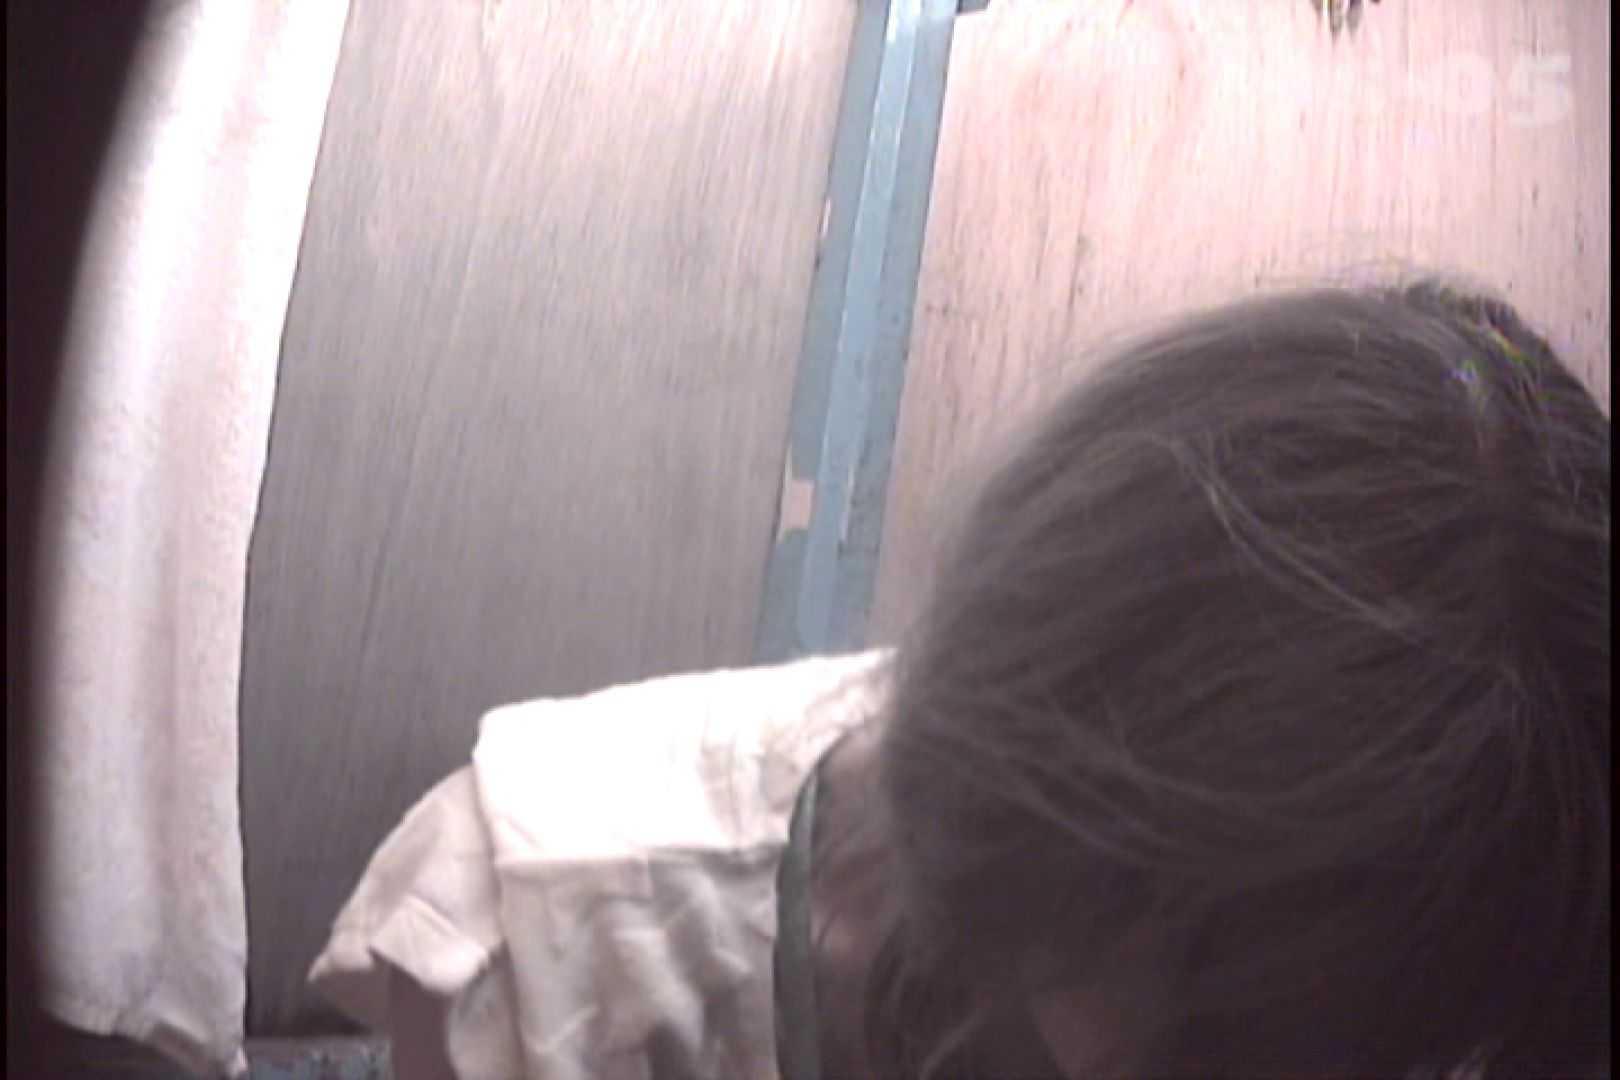 File.37 収穫の秋、こんなの取れました。必見です!【2011年20位】 盗撮映像大放出 | シャワー  75連発 7